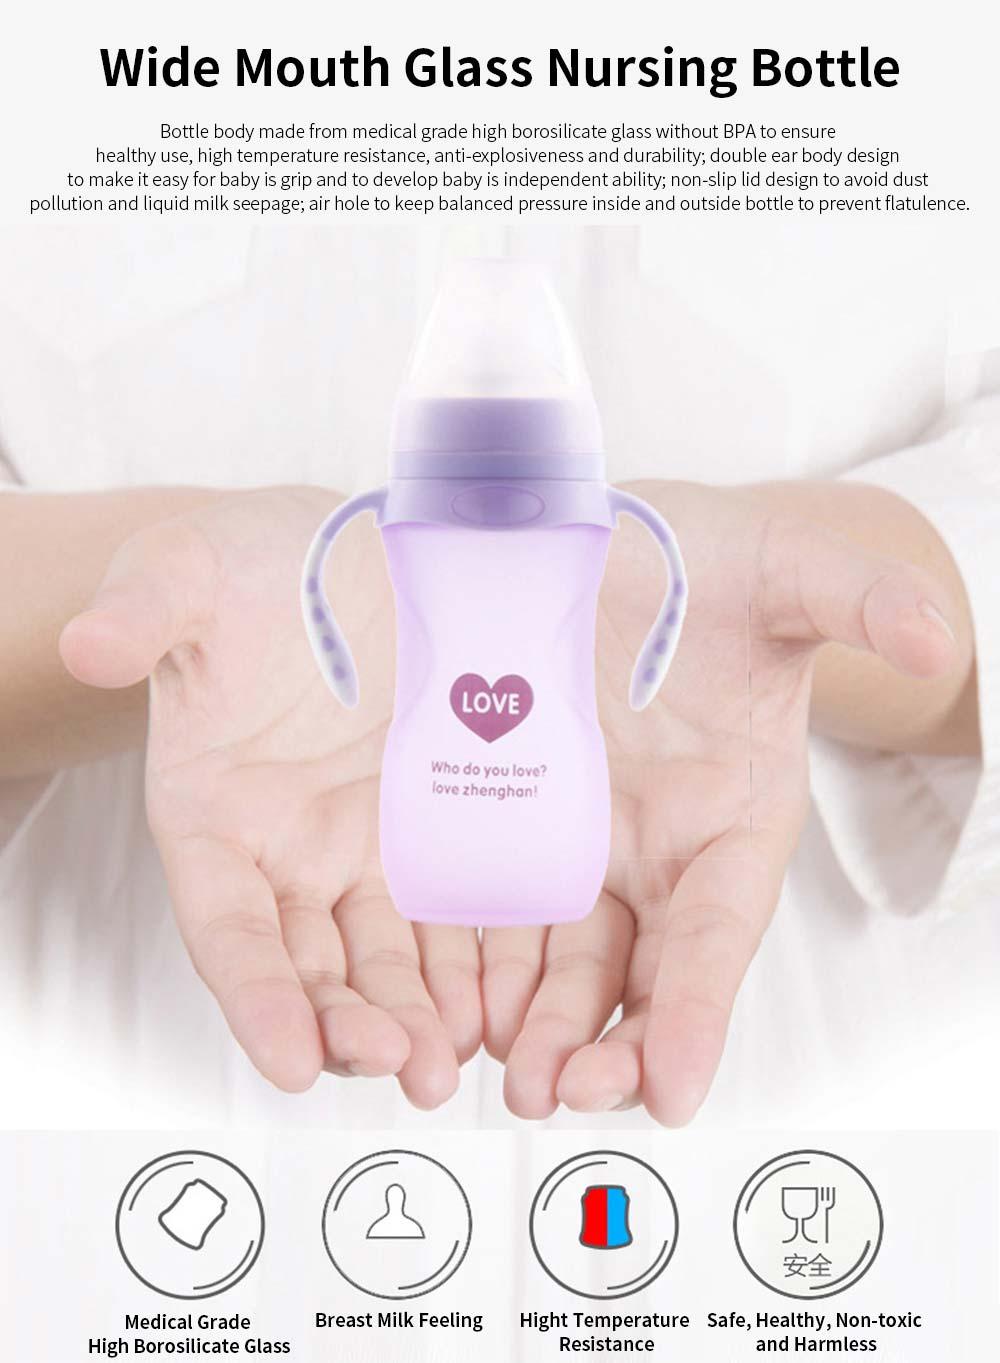 Silica Gel Nursing Bottle EXW, Wide Mouth Not Breakable Nurser Flatulence Prevention Glass Feeding Bottle for New-born Babies 0